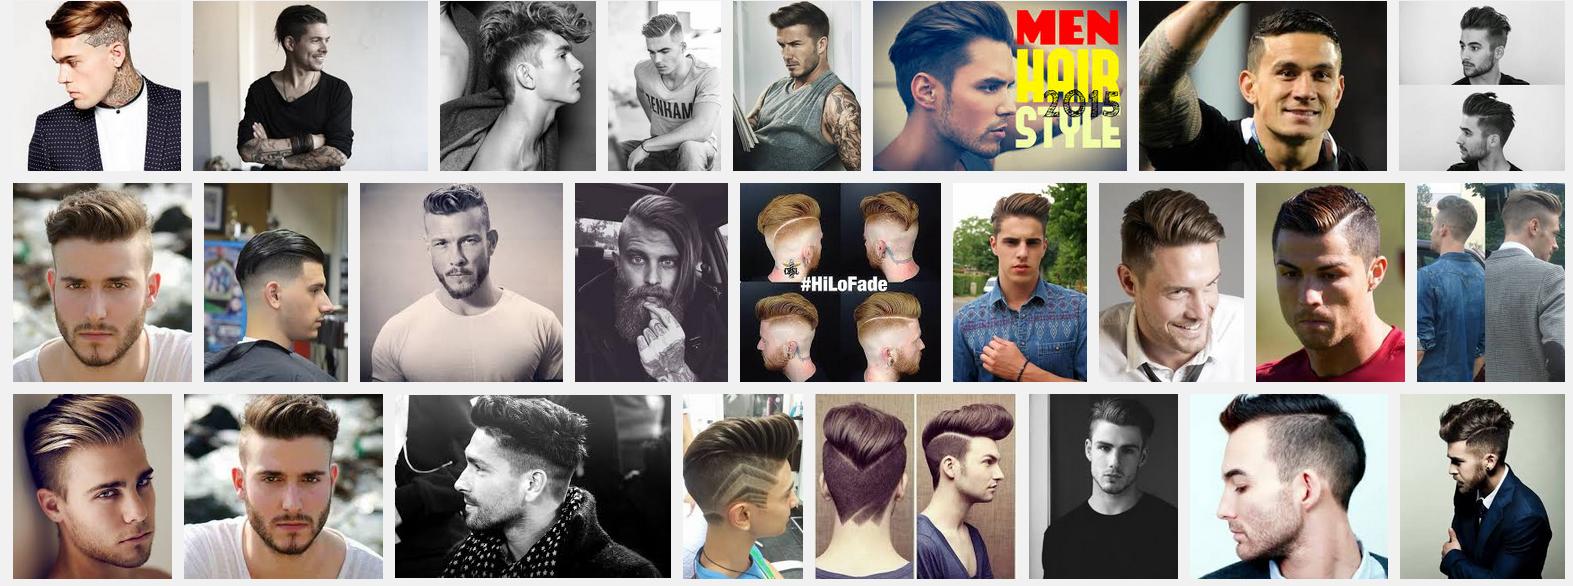 Inspirasi Model Gaya Rambut Undercut Pria Terbaik 2015 Terpopuler